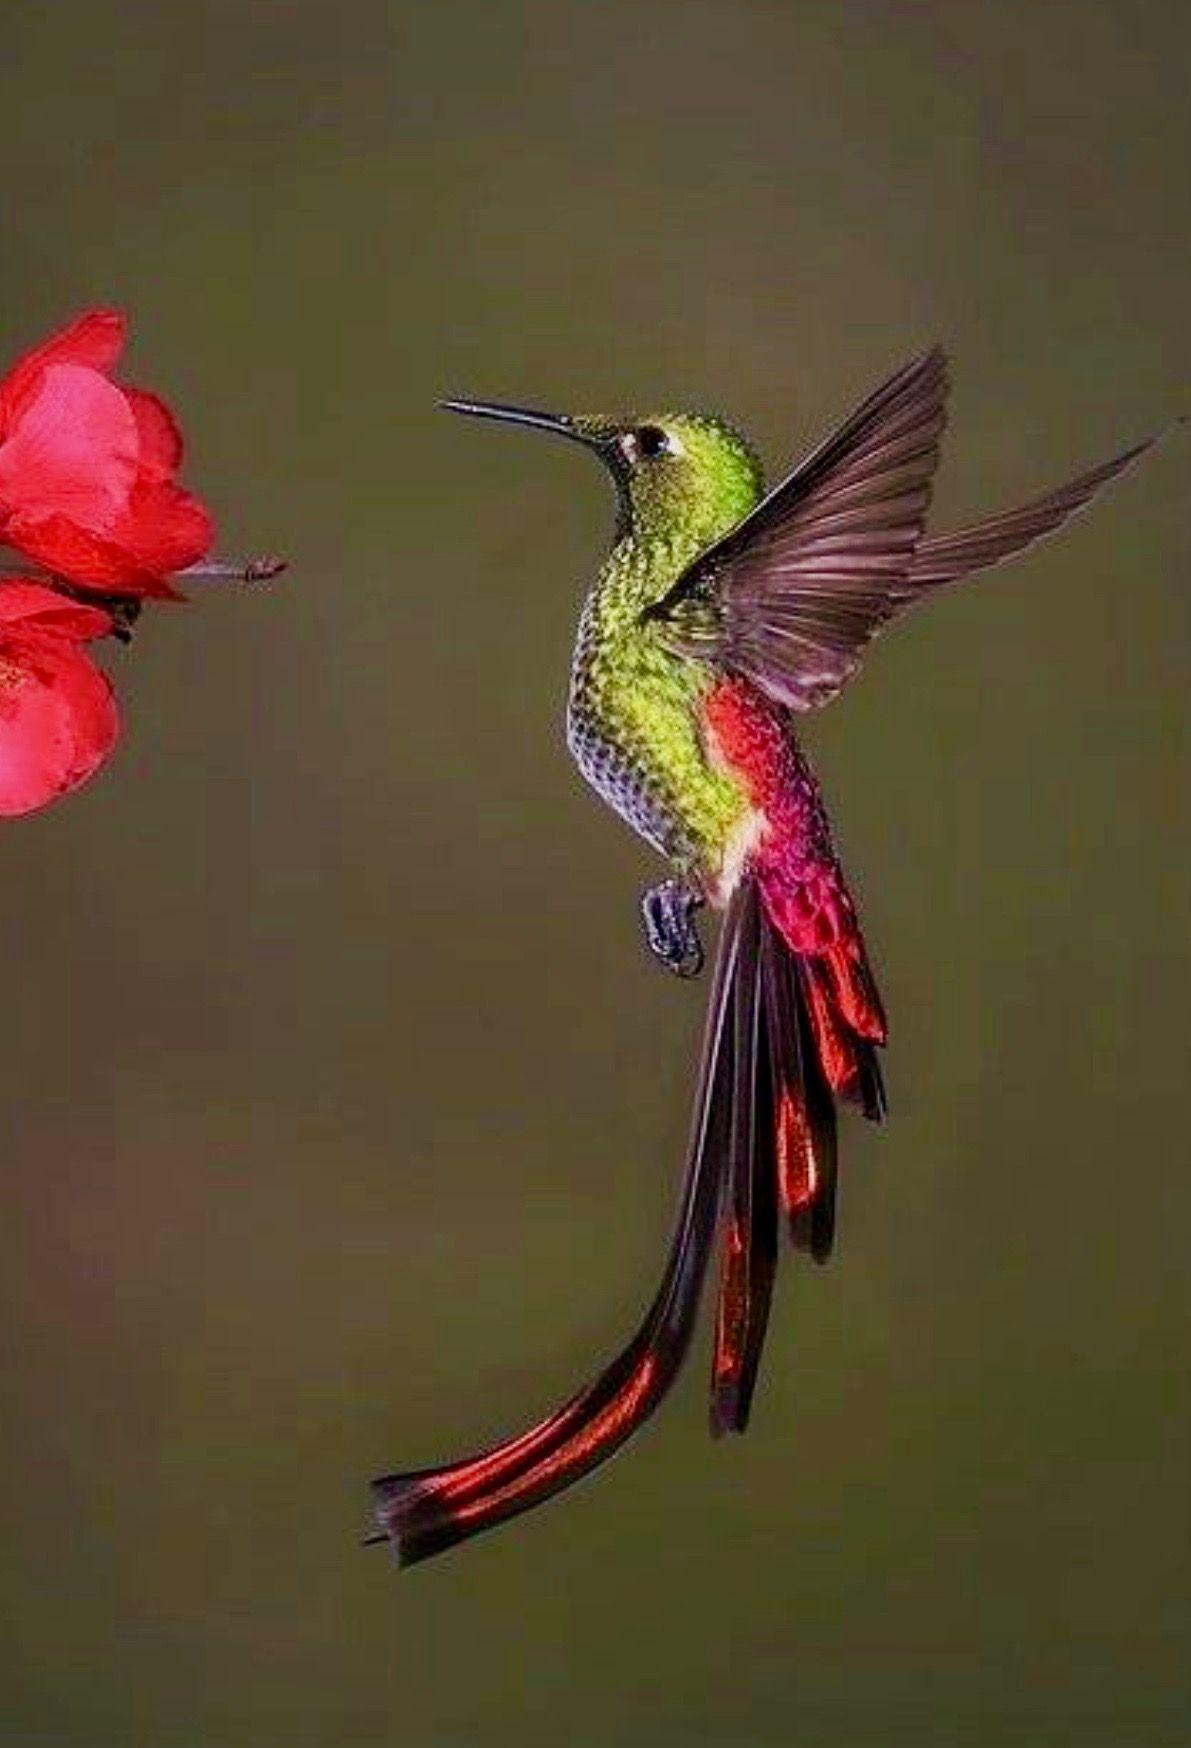 Large red hummingbird